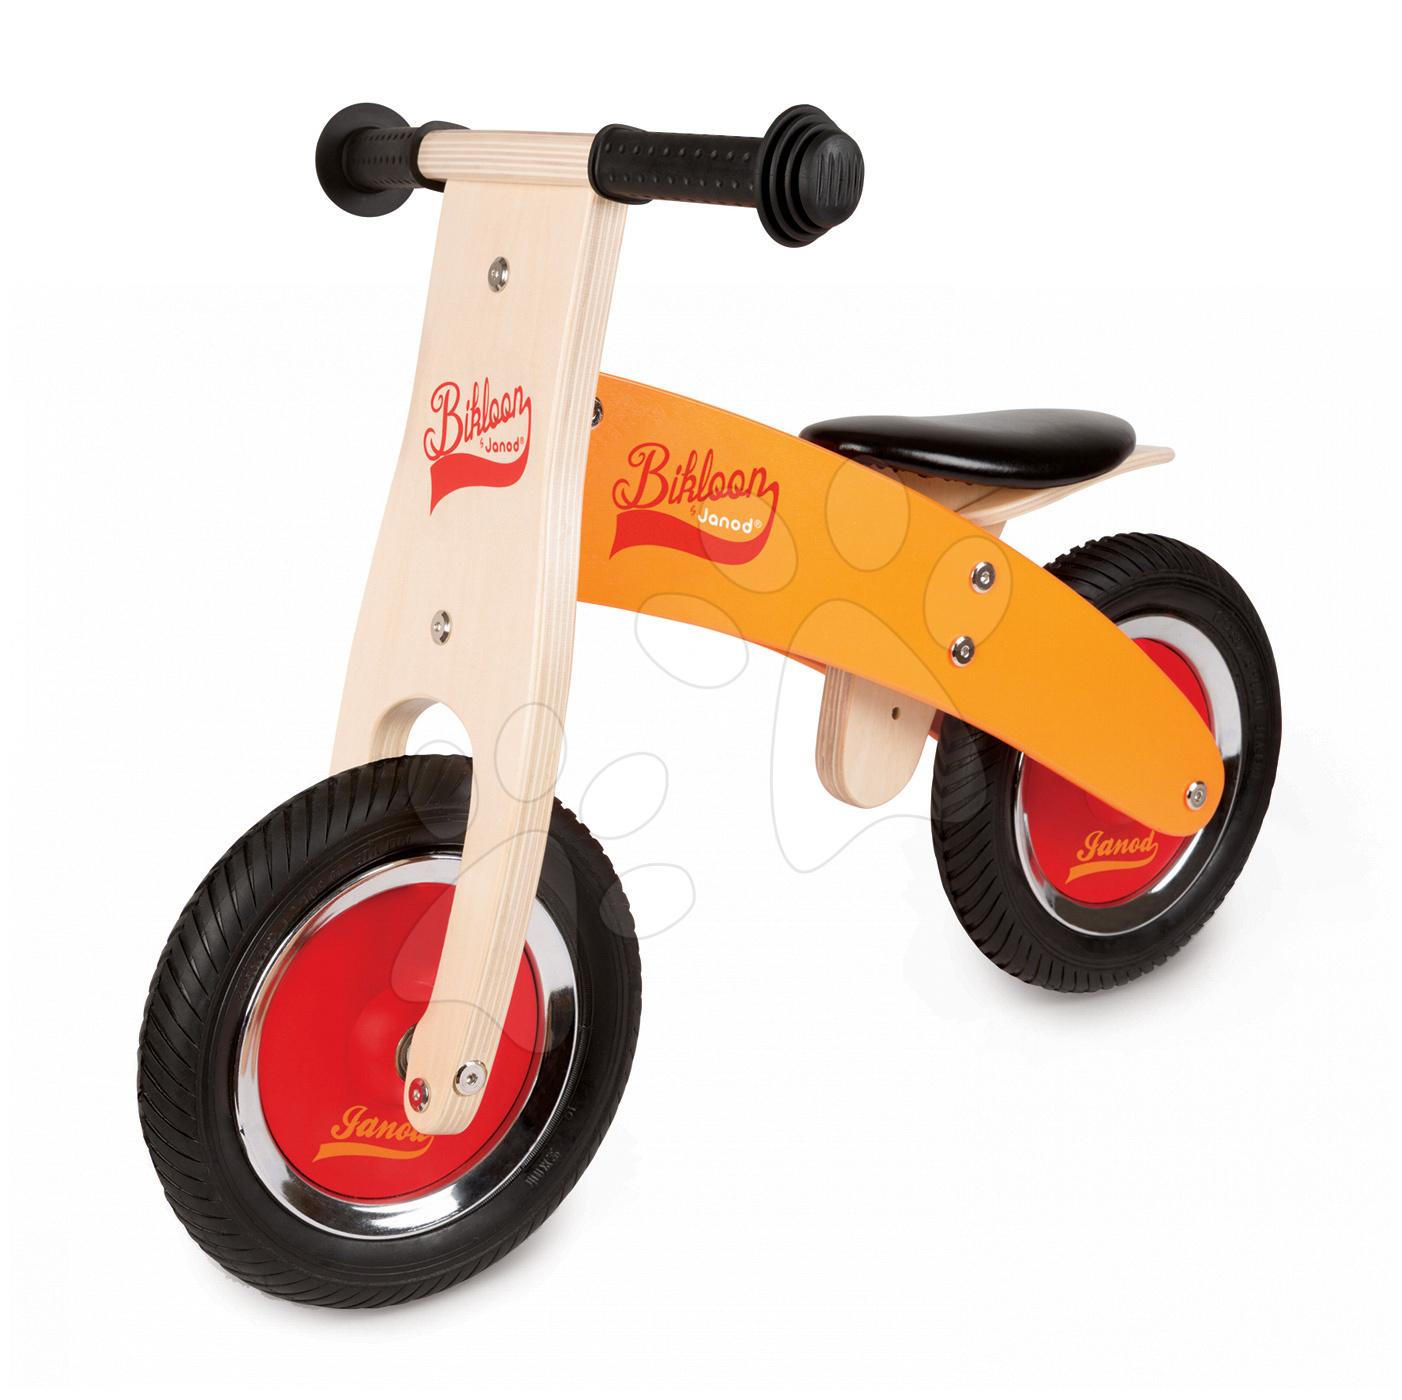 Drevené odrážadlá - Drevený balančný bicykel Little Bikloon Janod od 24 mes